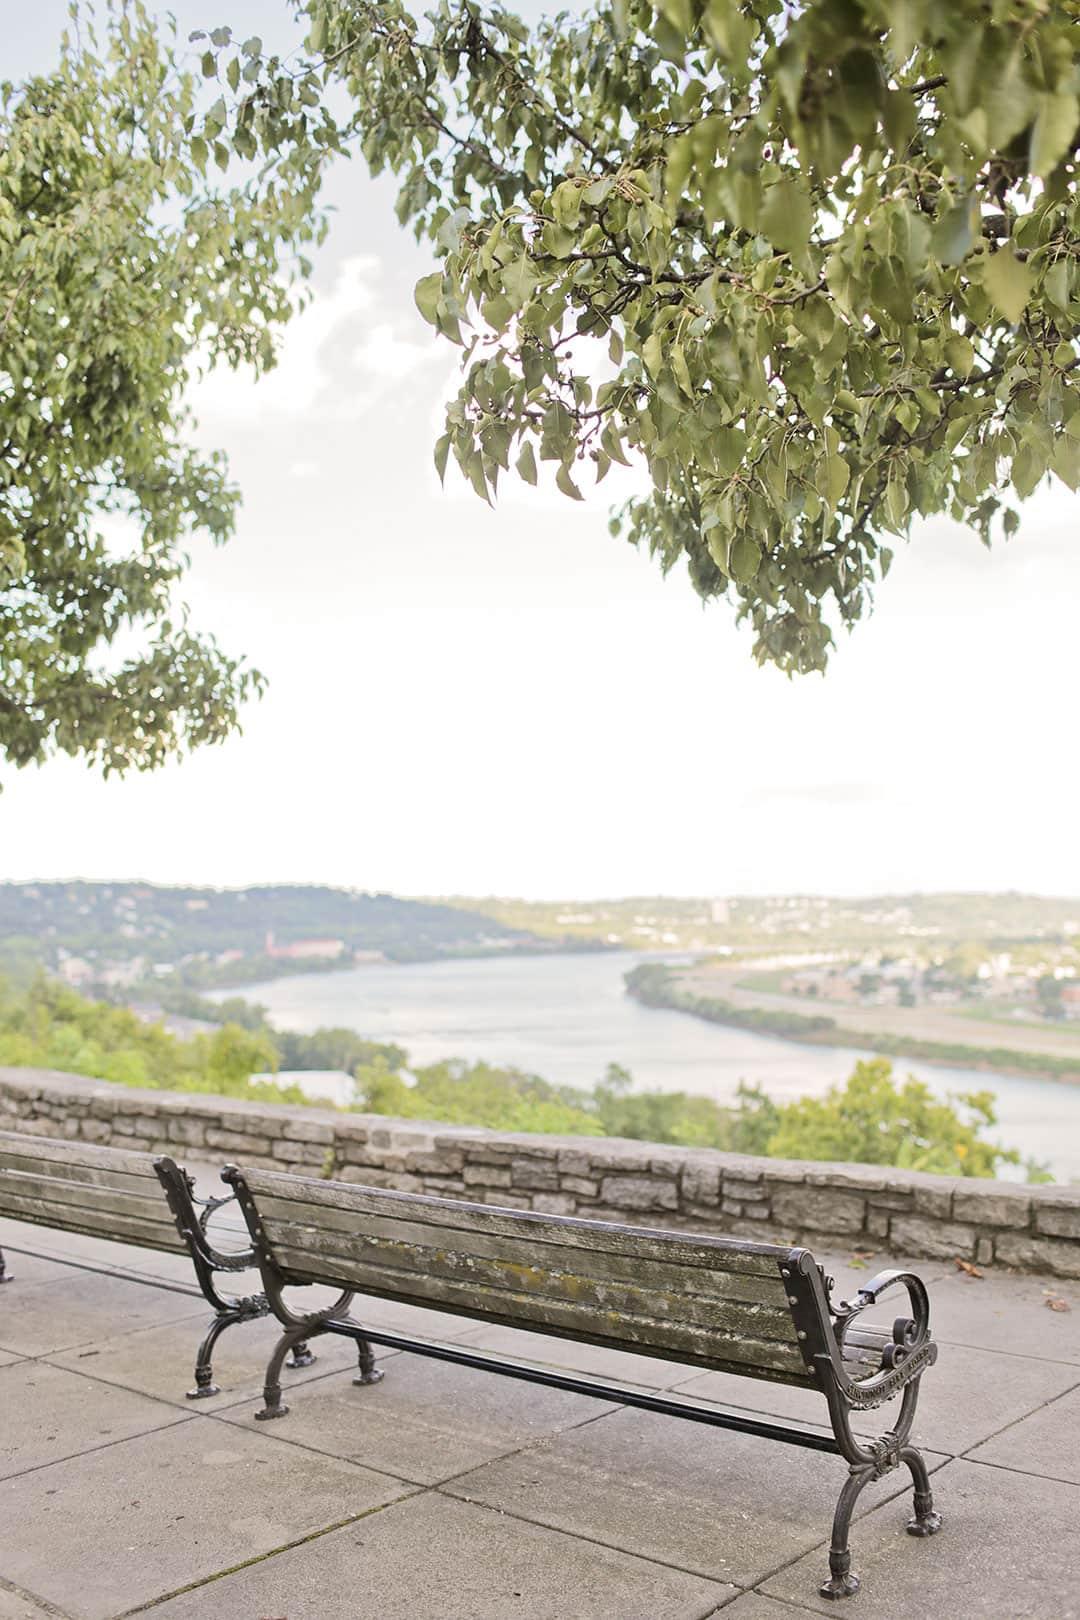 Cincinnati View + 15 Best Places to Visit in September in USA